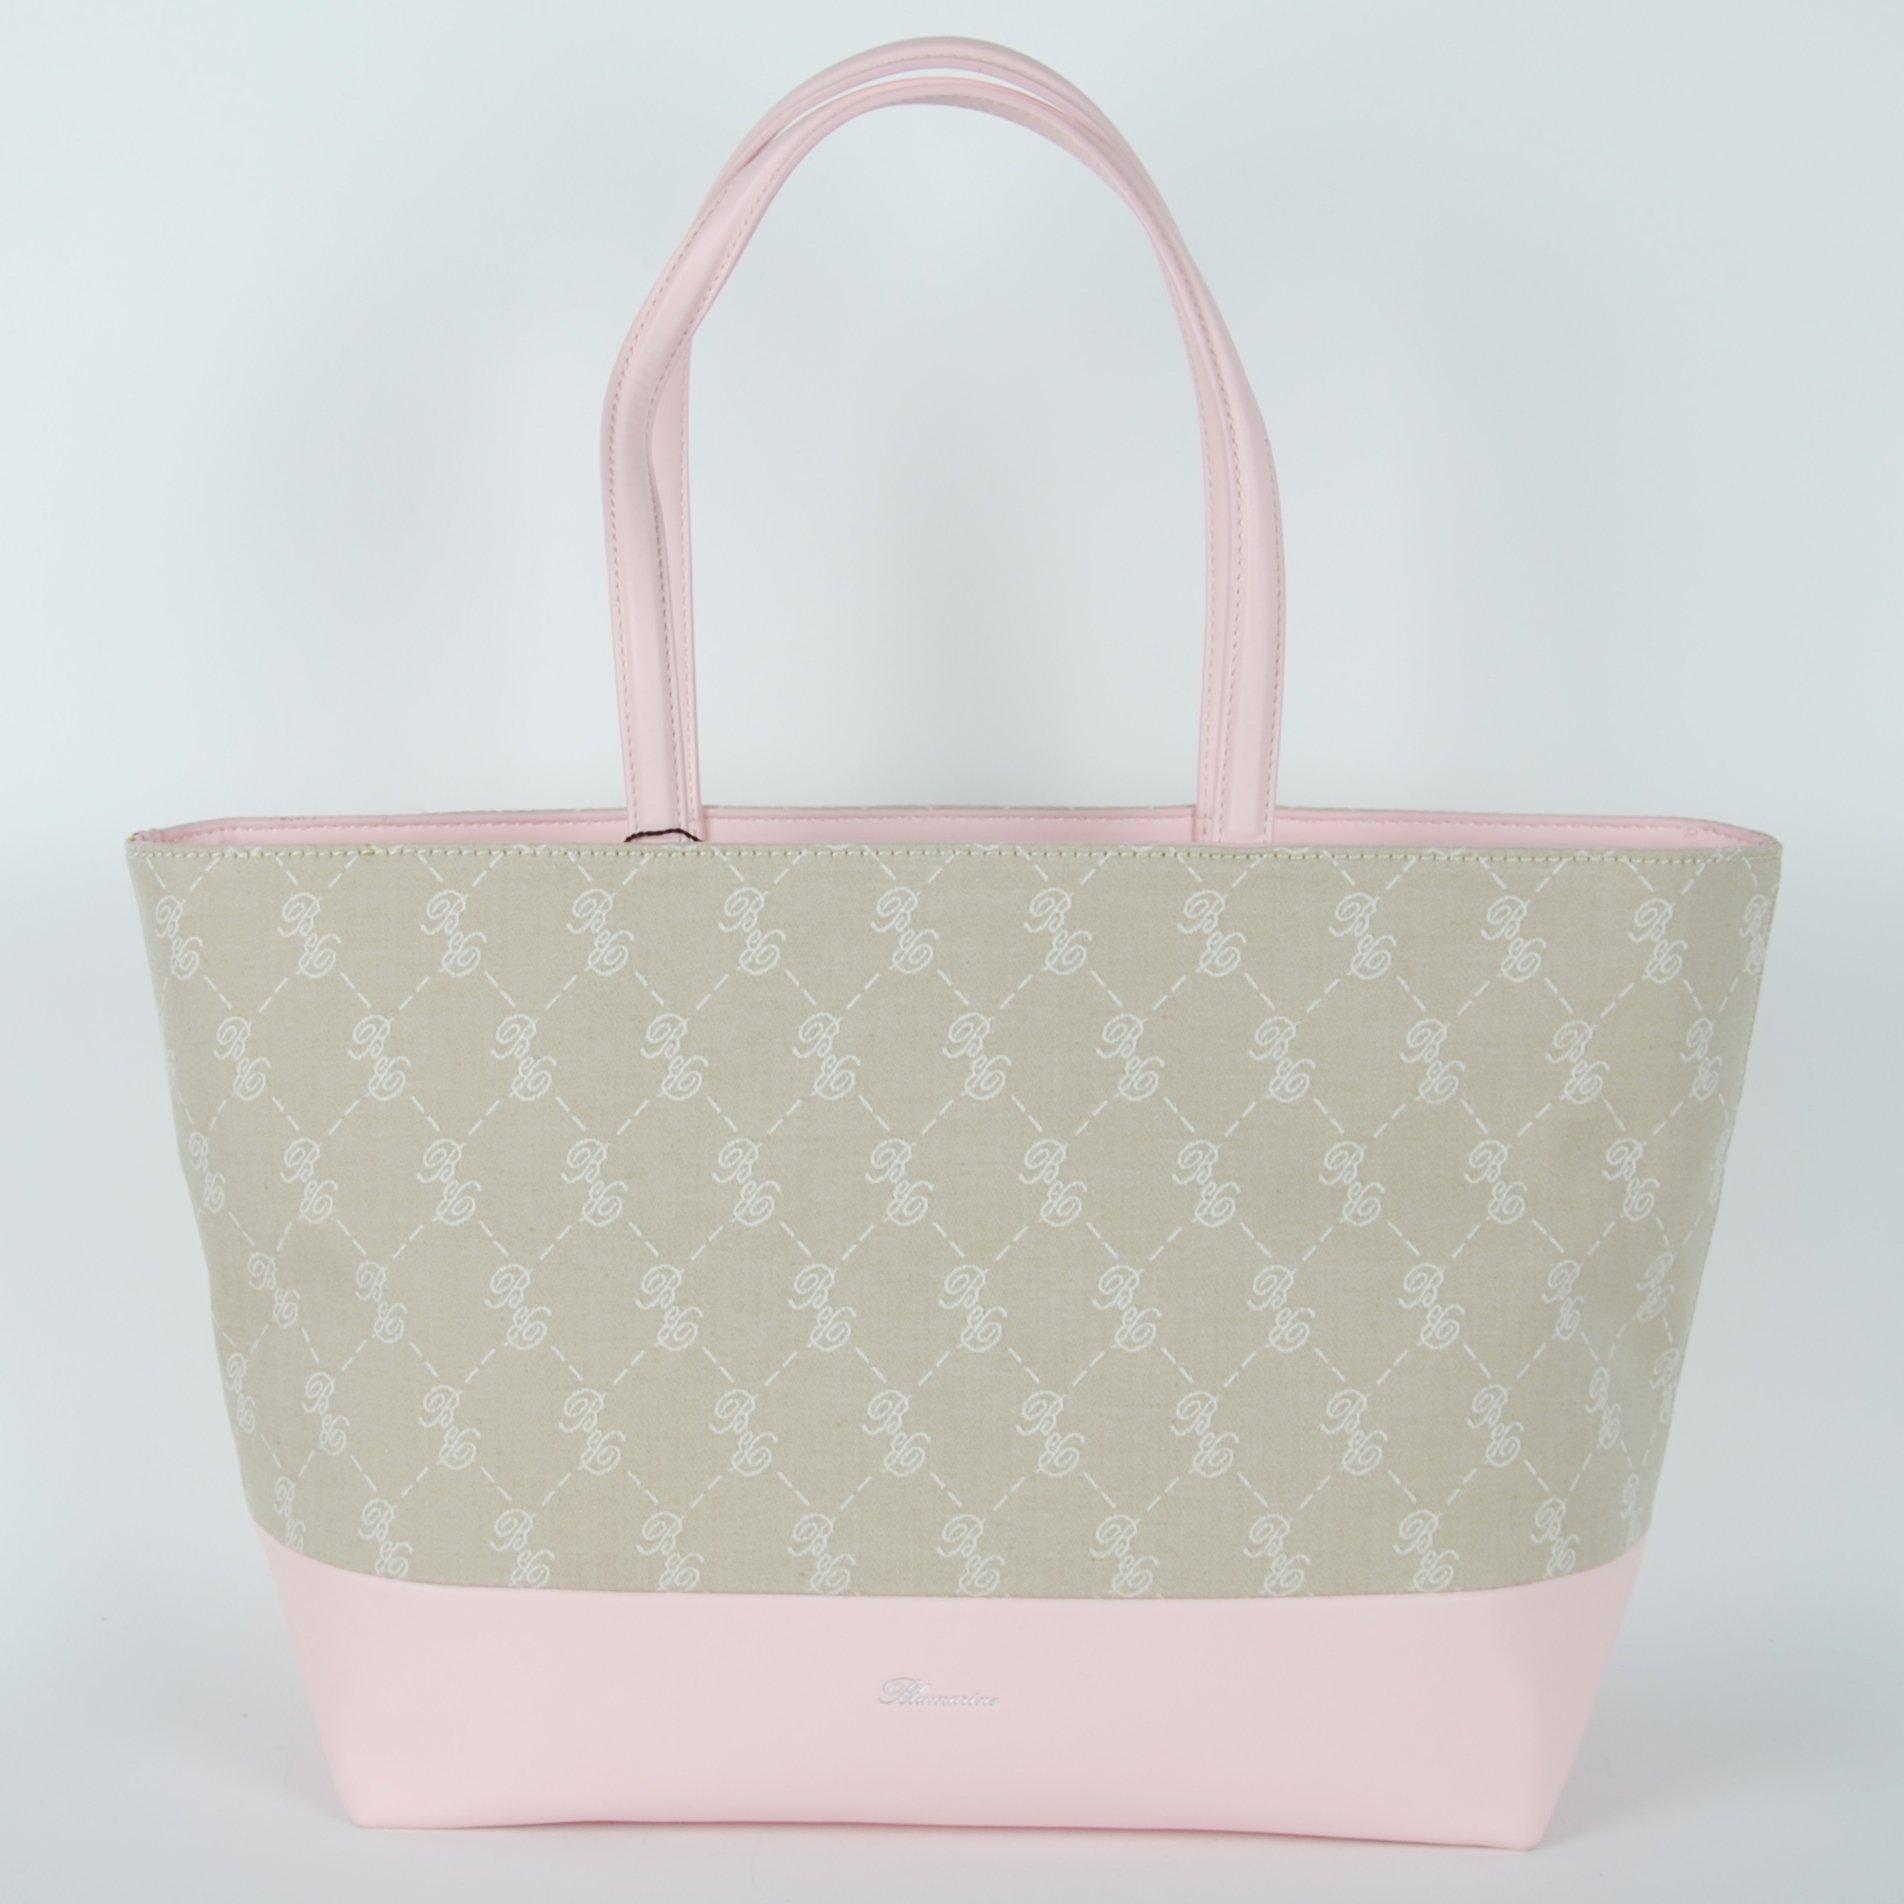 Blumarine Women's Shopping Bag Pink BL1421482